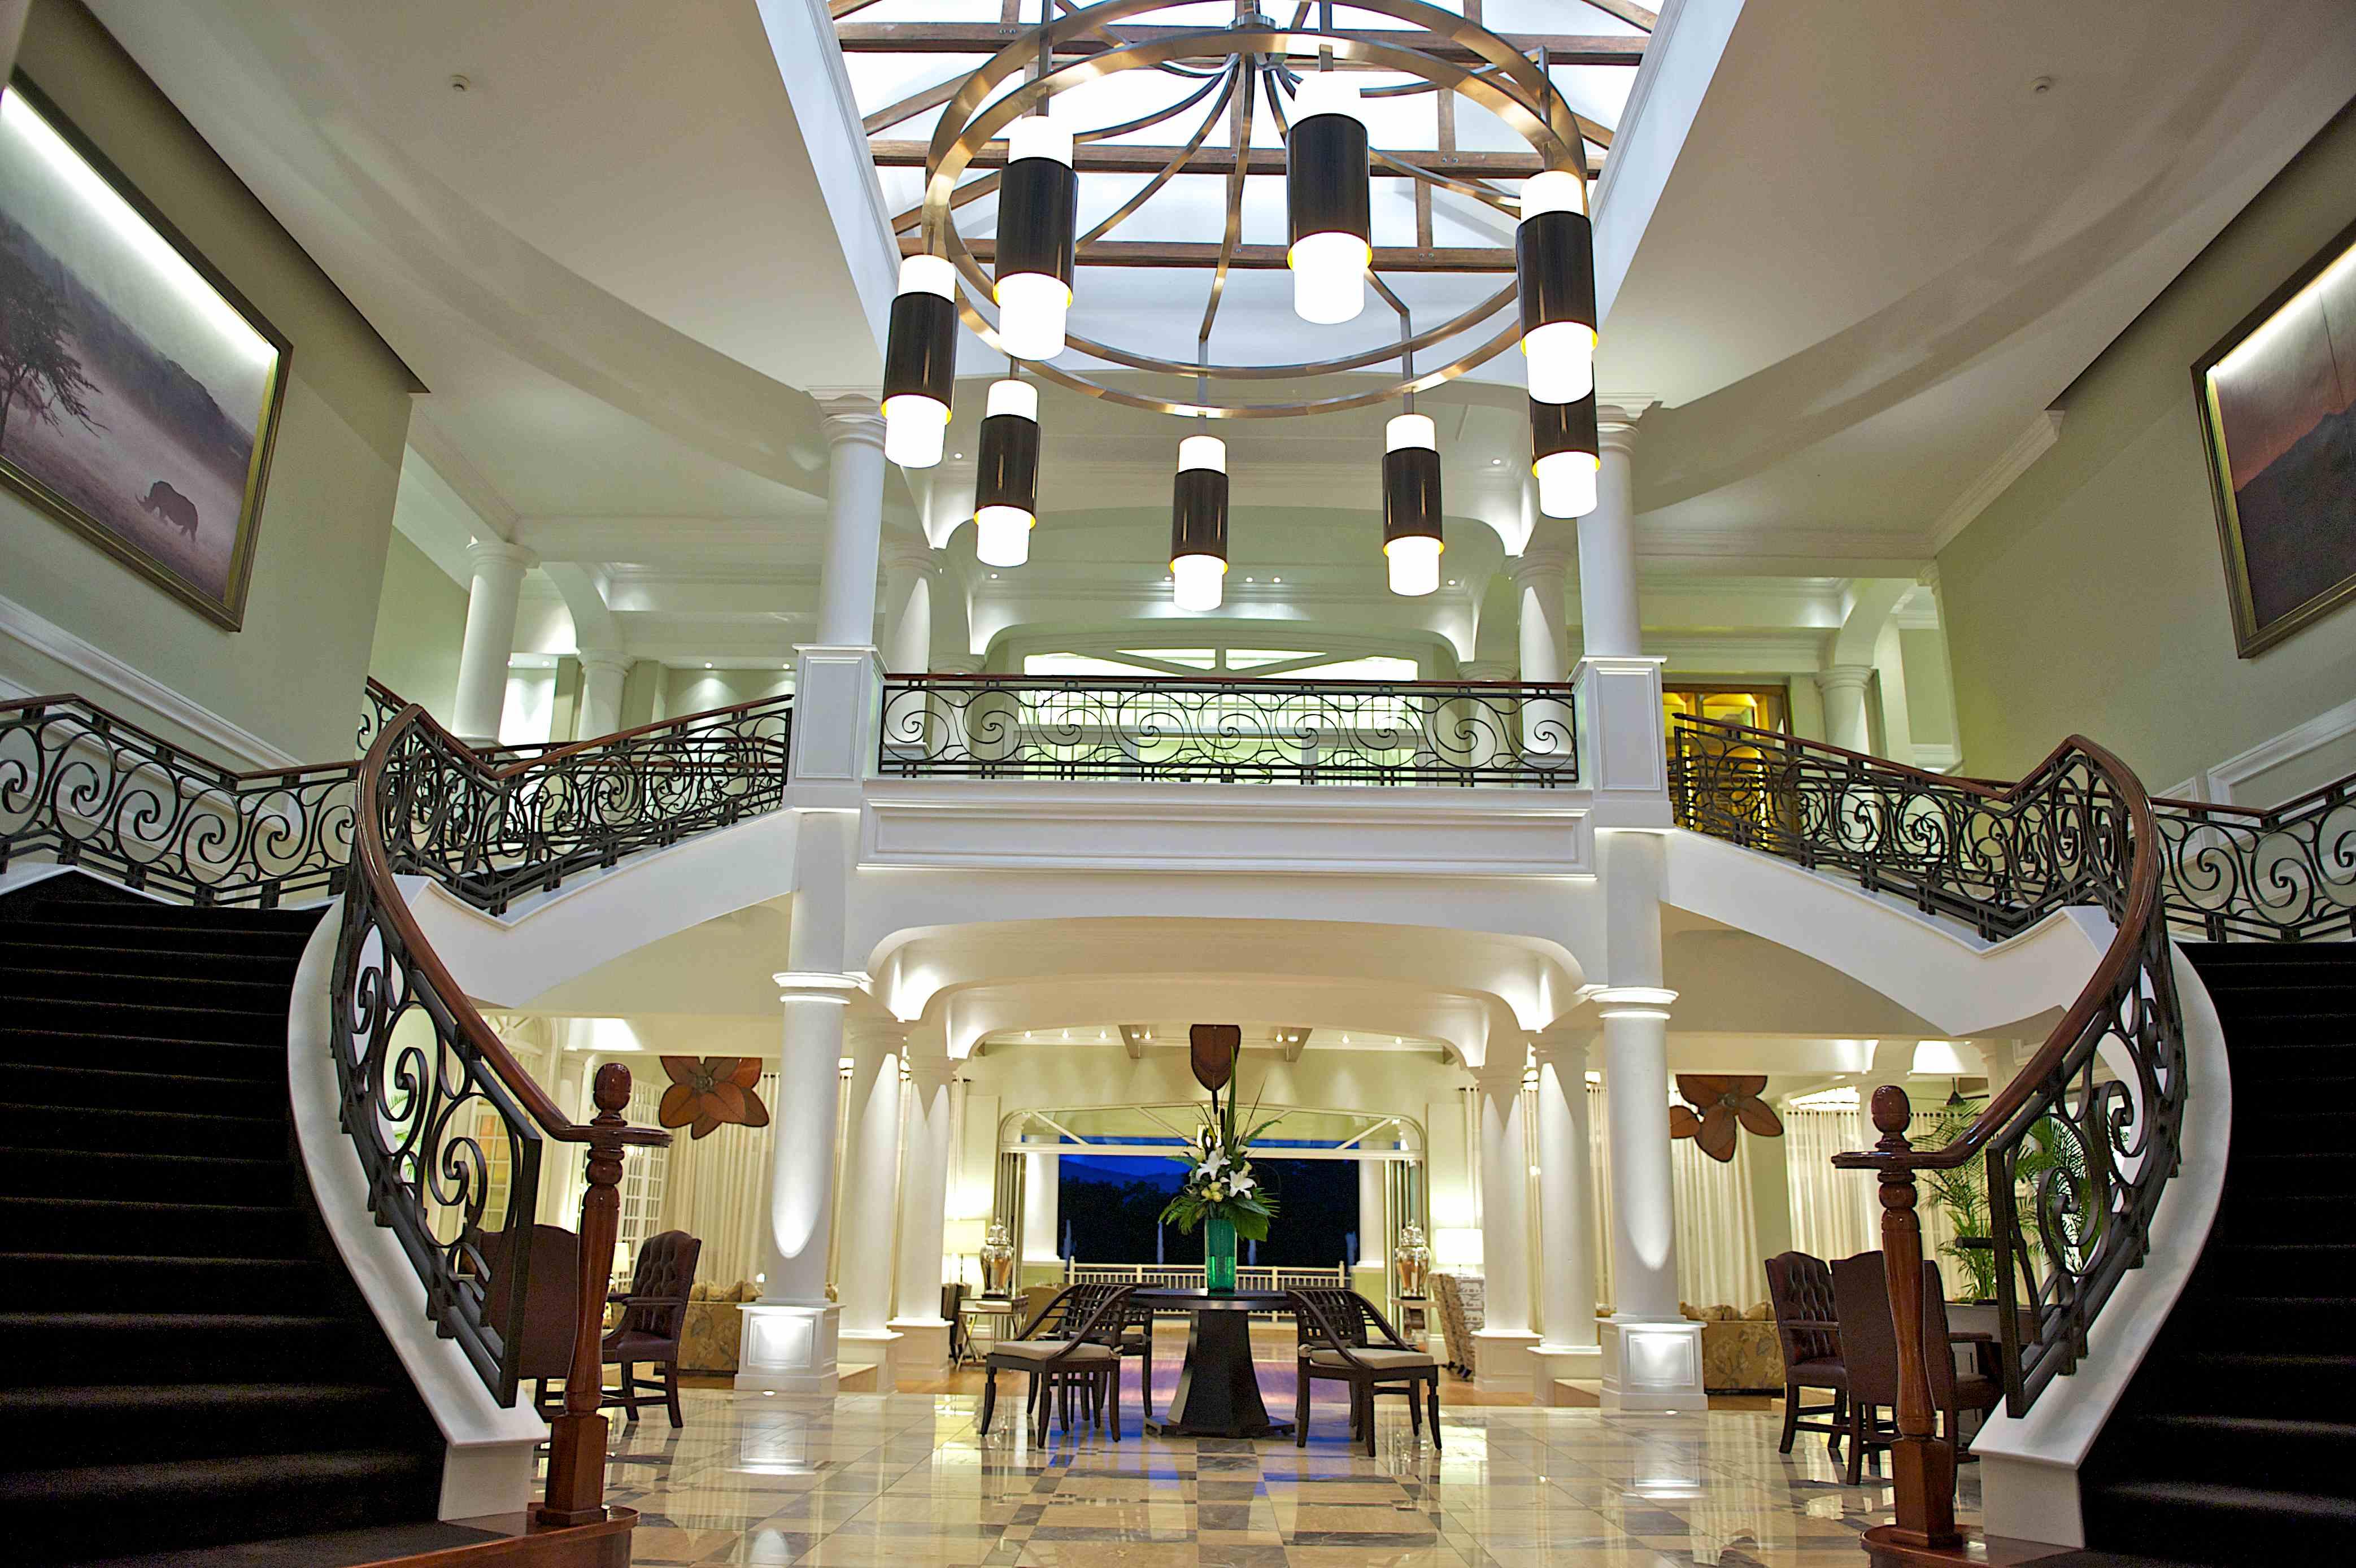 Hemingways Hotel, Nairobi | Bespoke horel/leisure lighting | The Light Lab